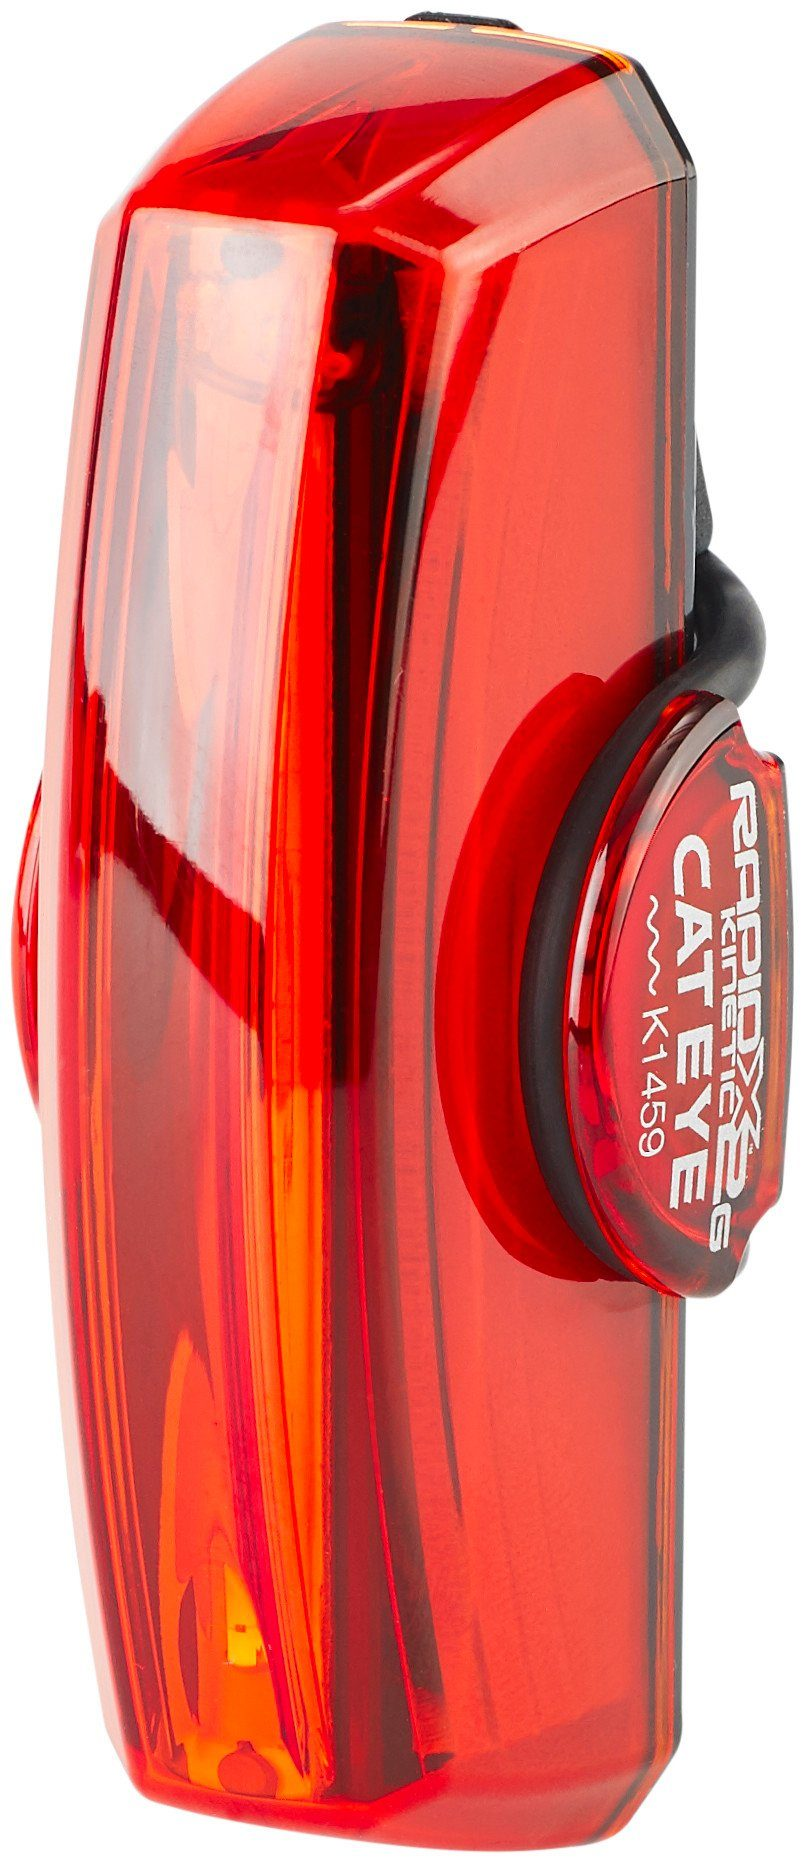 Cateye Fahrradbeleuchtung »TL-LD710GK Rapid X2G Kinetic LED Rücklicht mit«